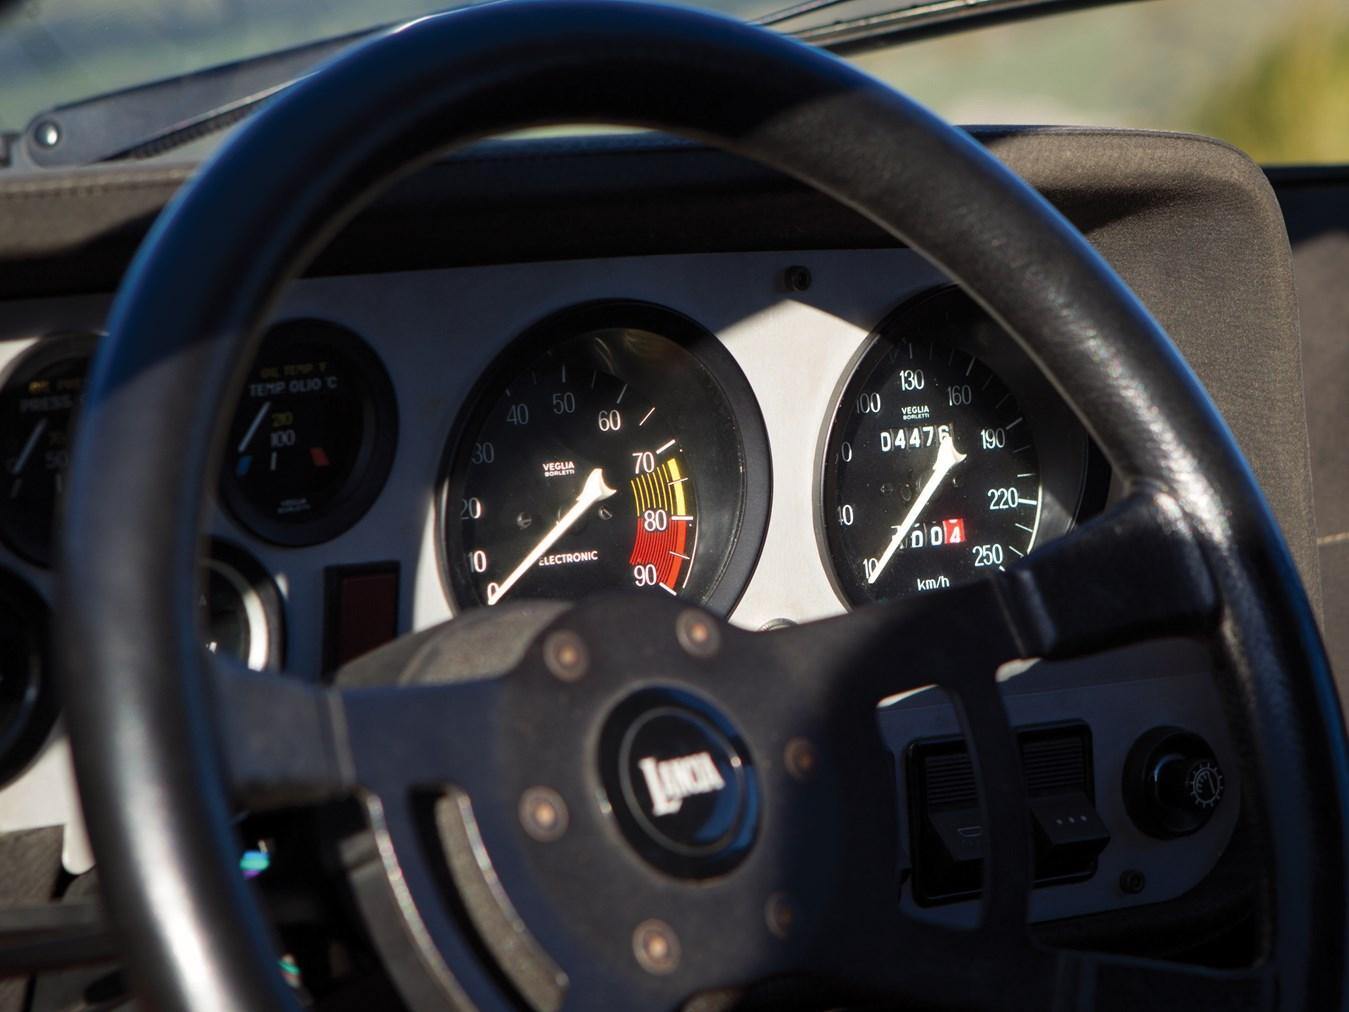 1974 Lancia Stratos HF Stradale steering wheel